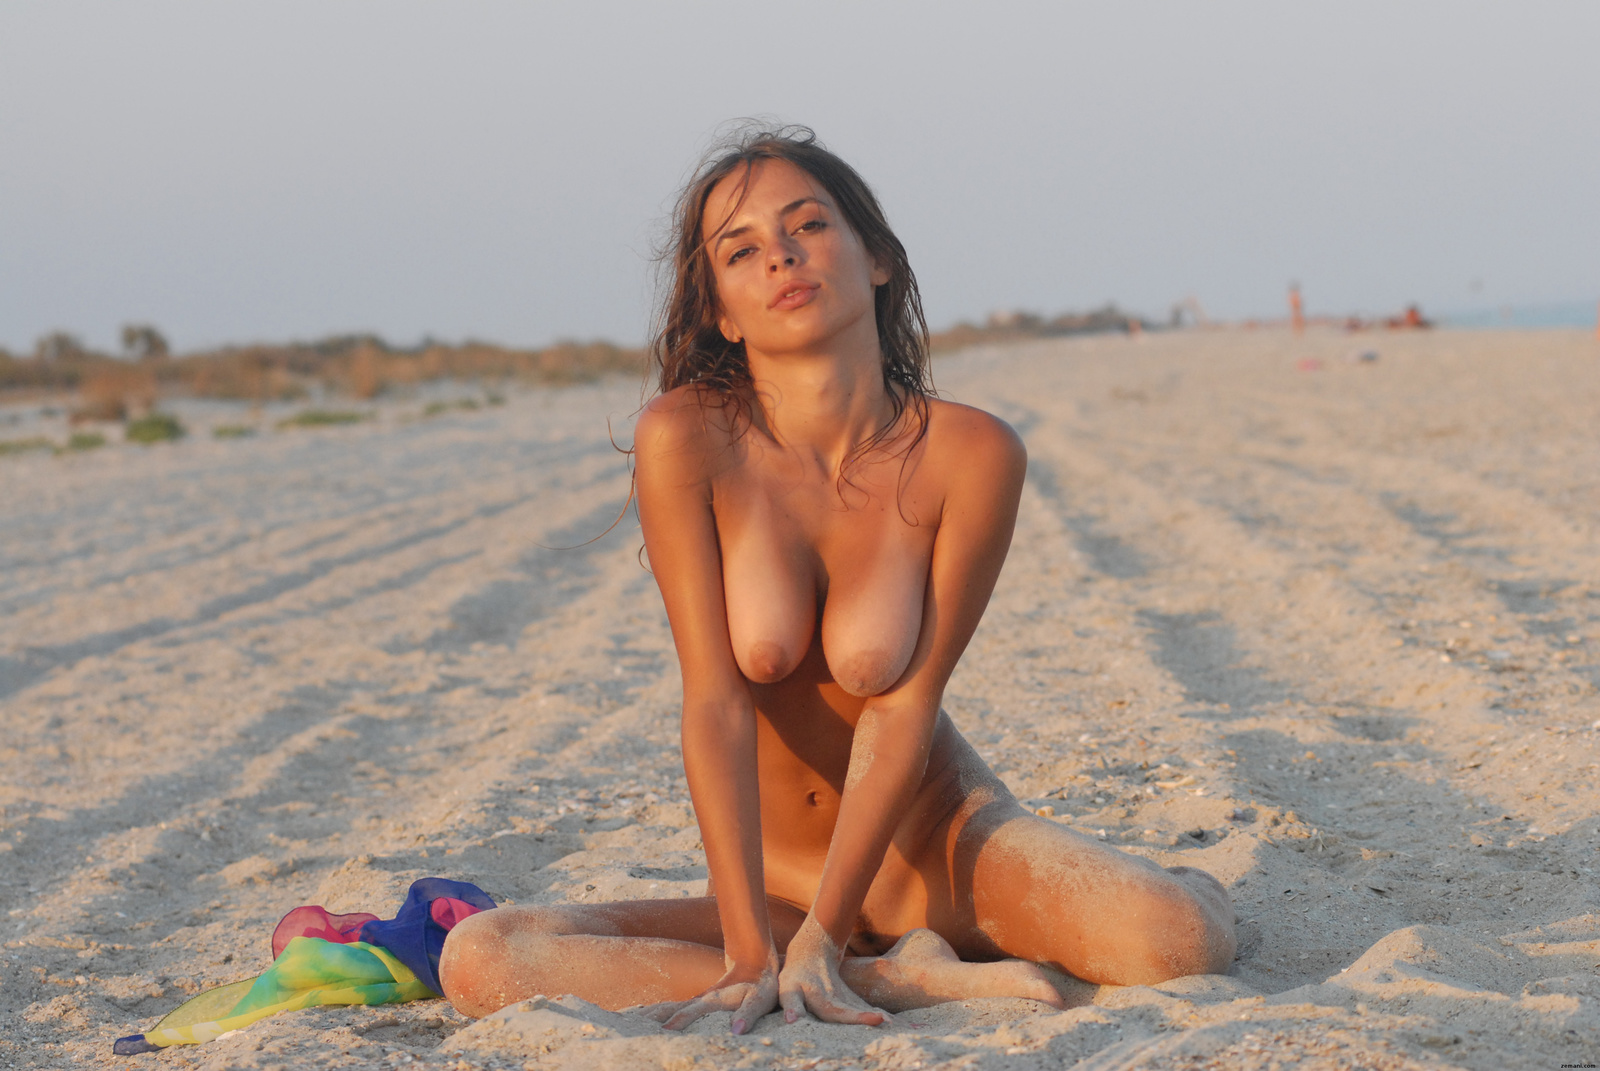 Zdjęcie porno - 082 - Naturalne piersi